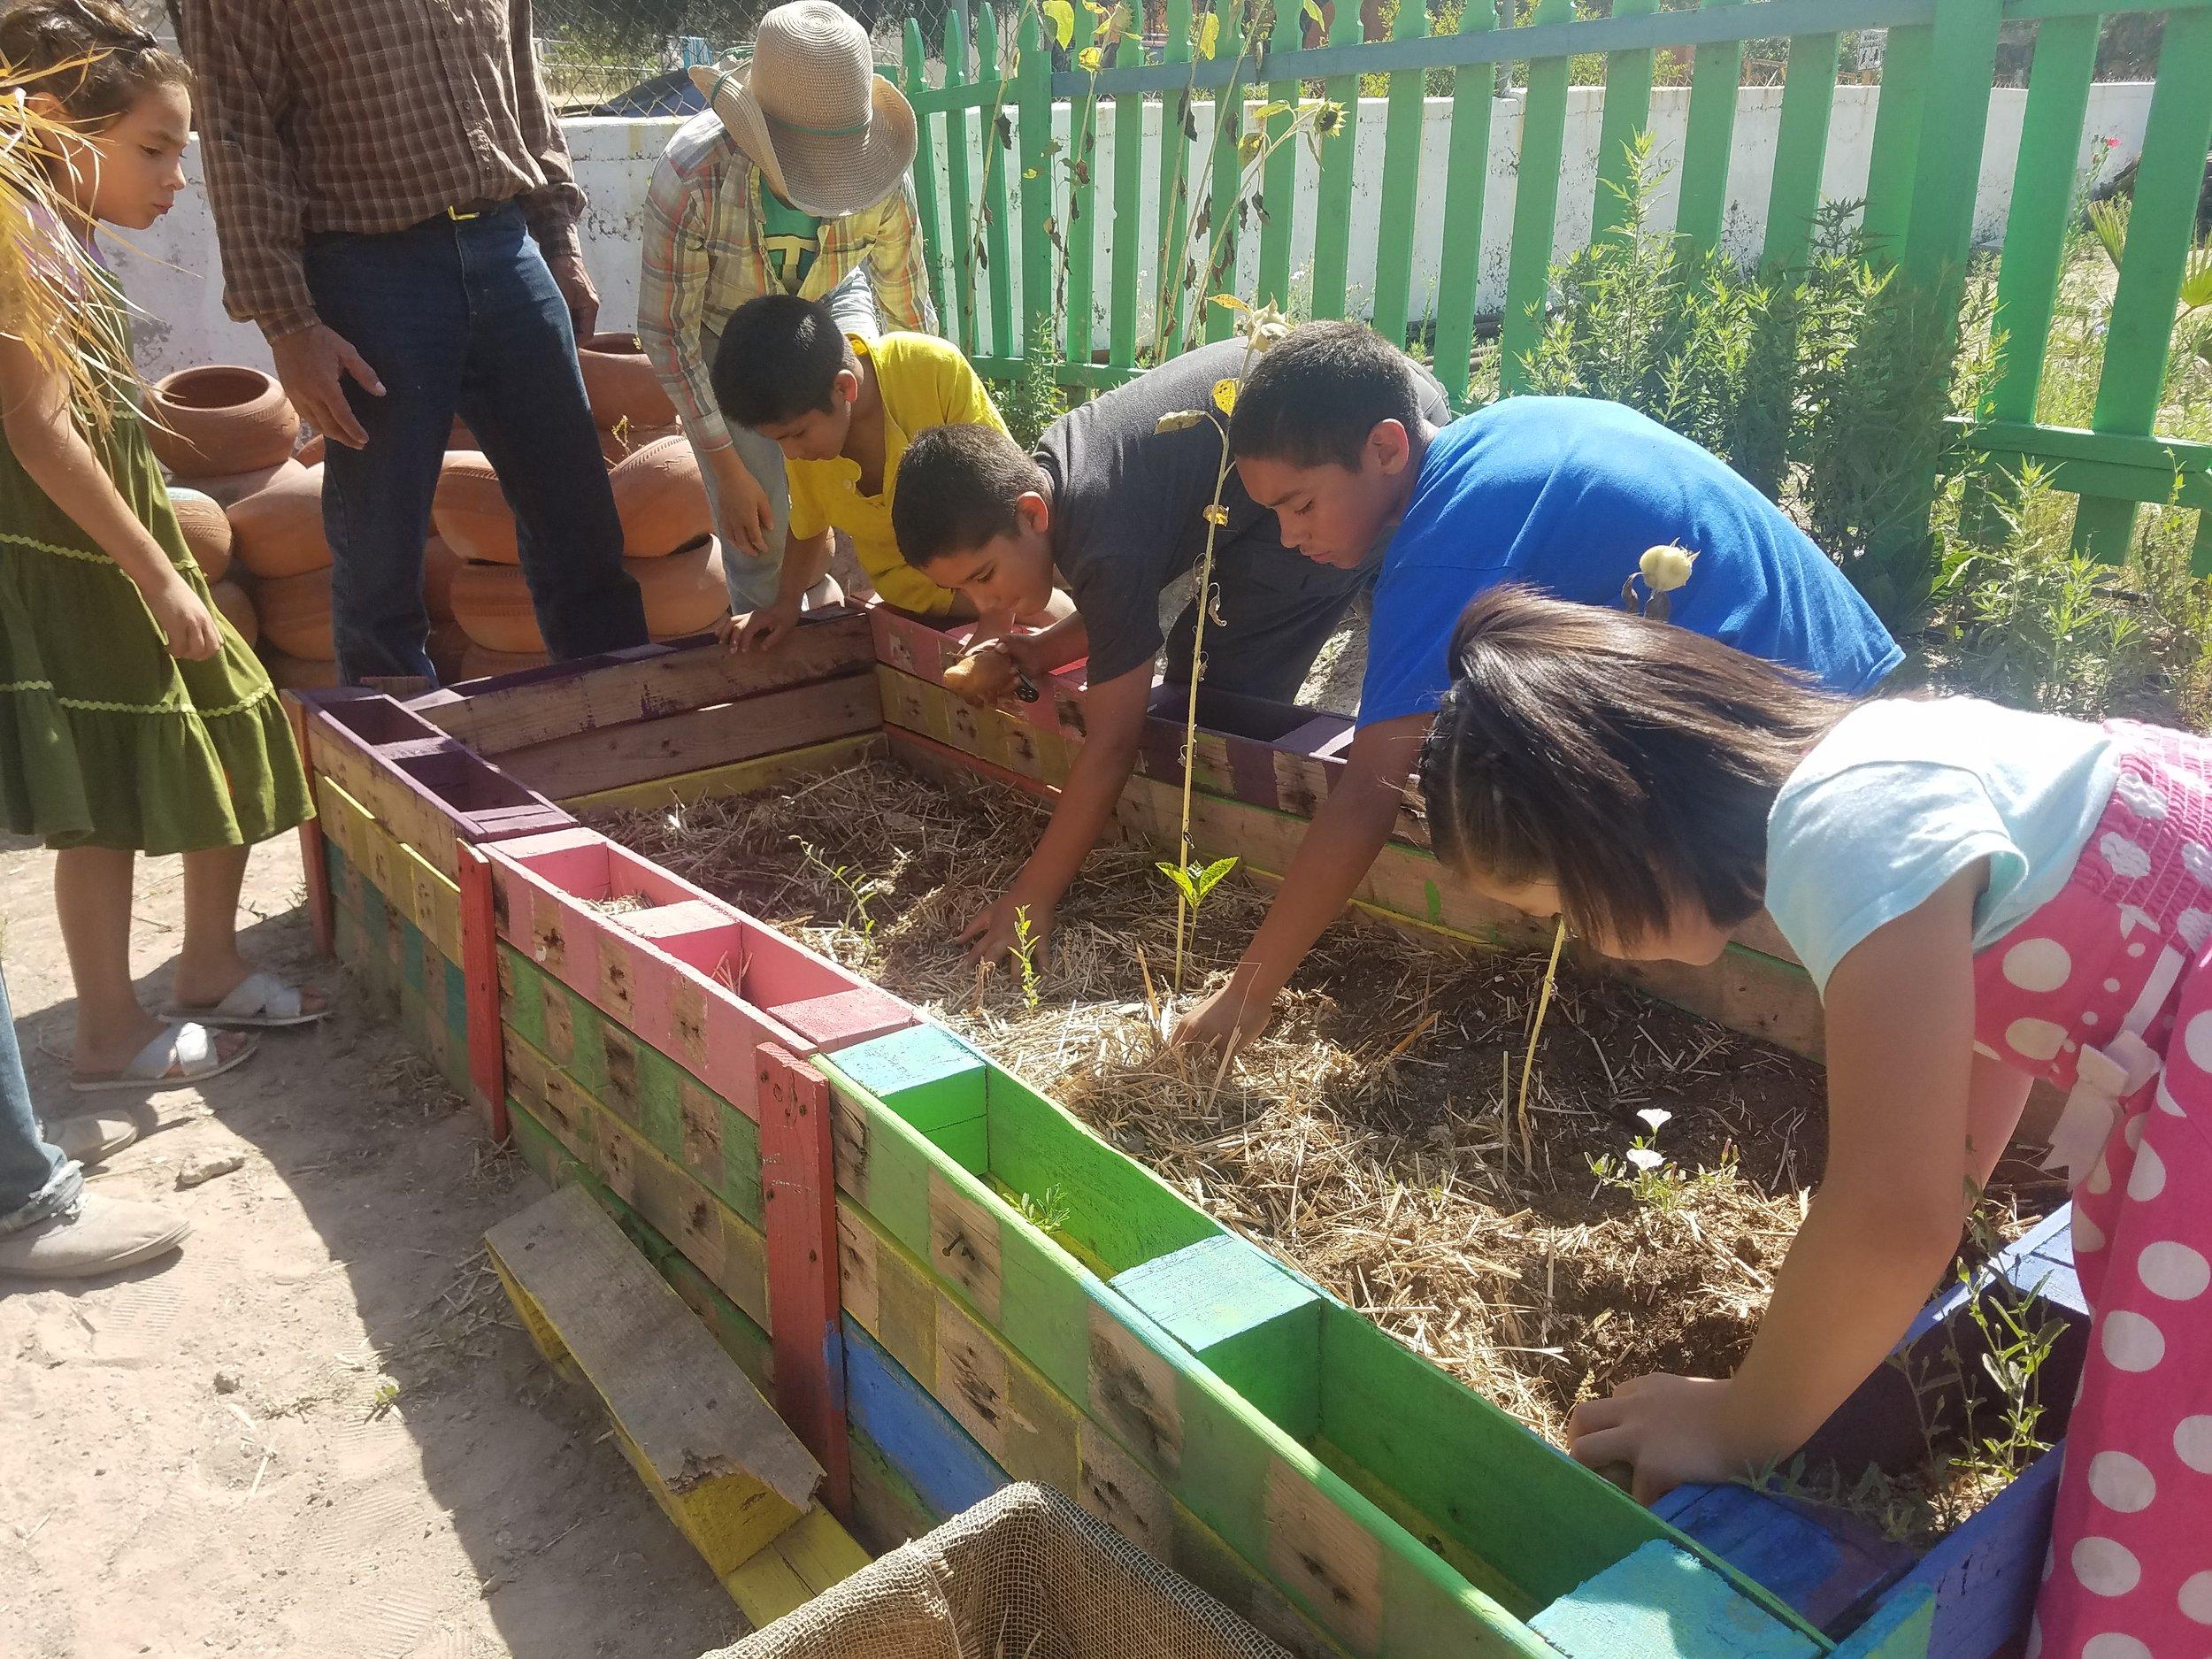 Garden-Based Learning Program - Teaching Sustainable Nutrition